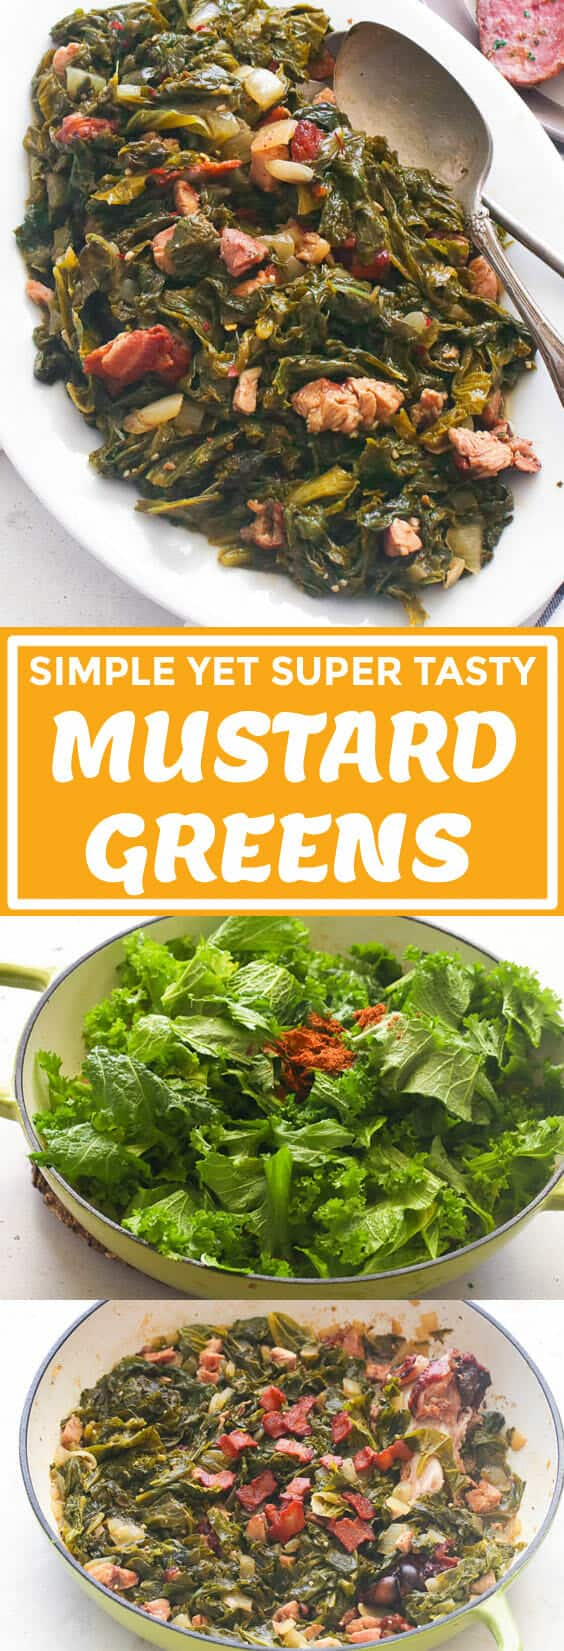 Southern Mustard Greens